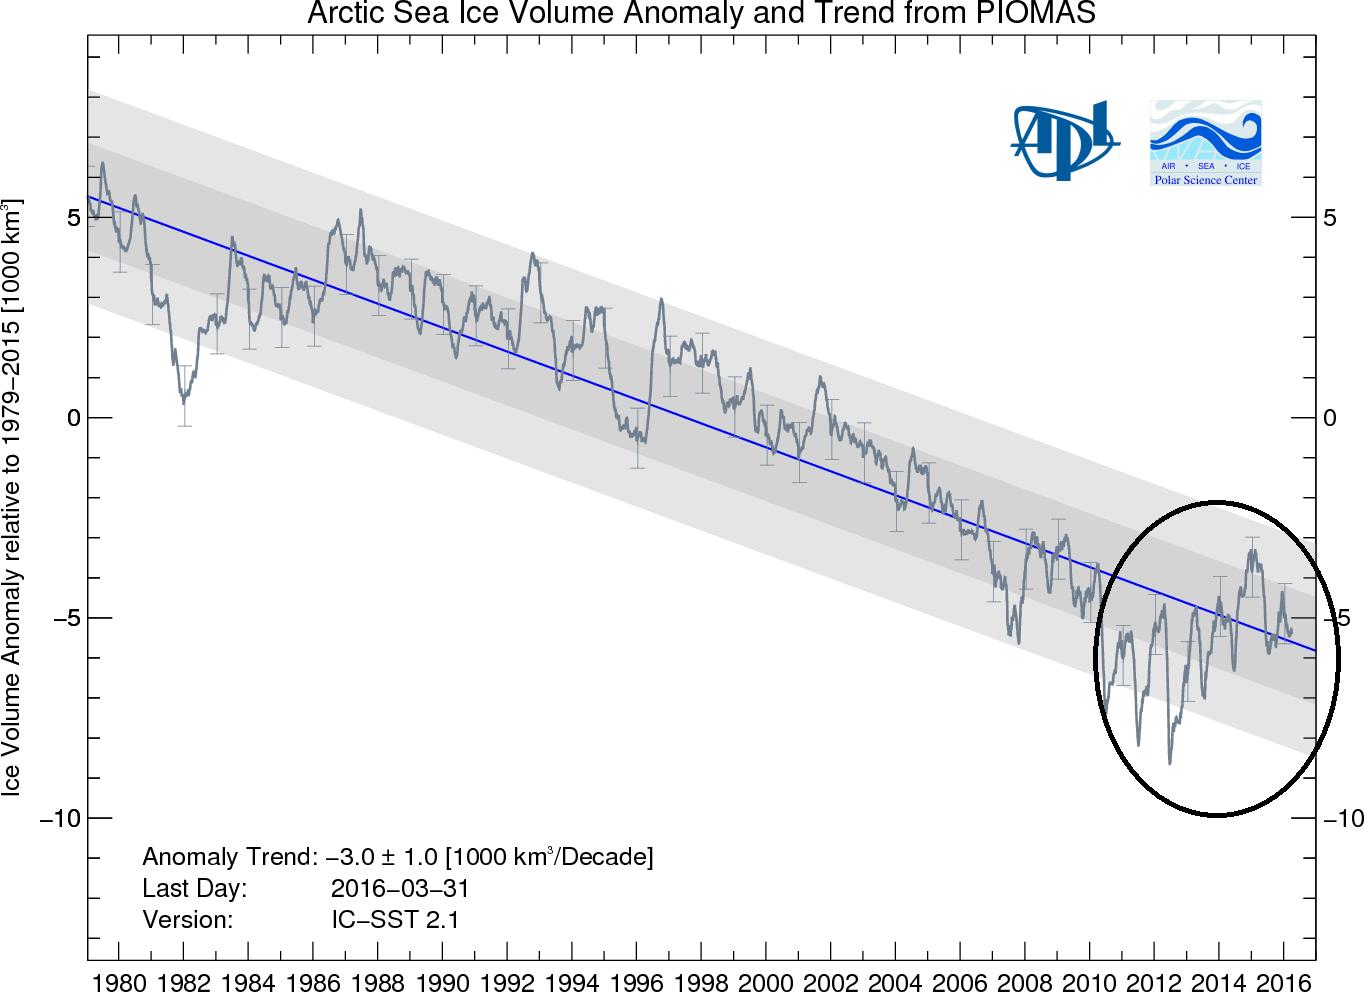 Arctic sea ice volume anomaly and trend from PIOMAS;courtesy University of Washington, PIOMAS, Zhang and Rothrock, 2003